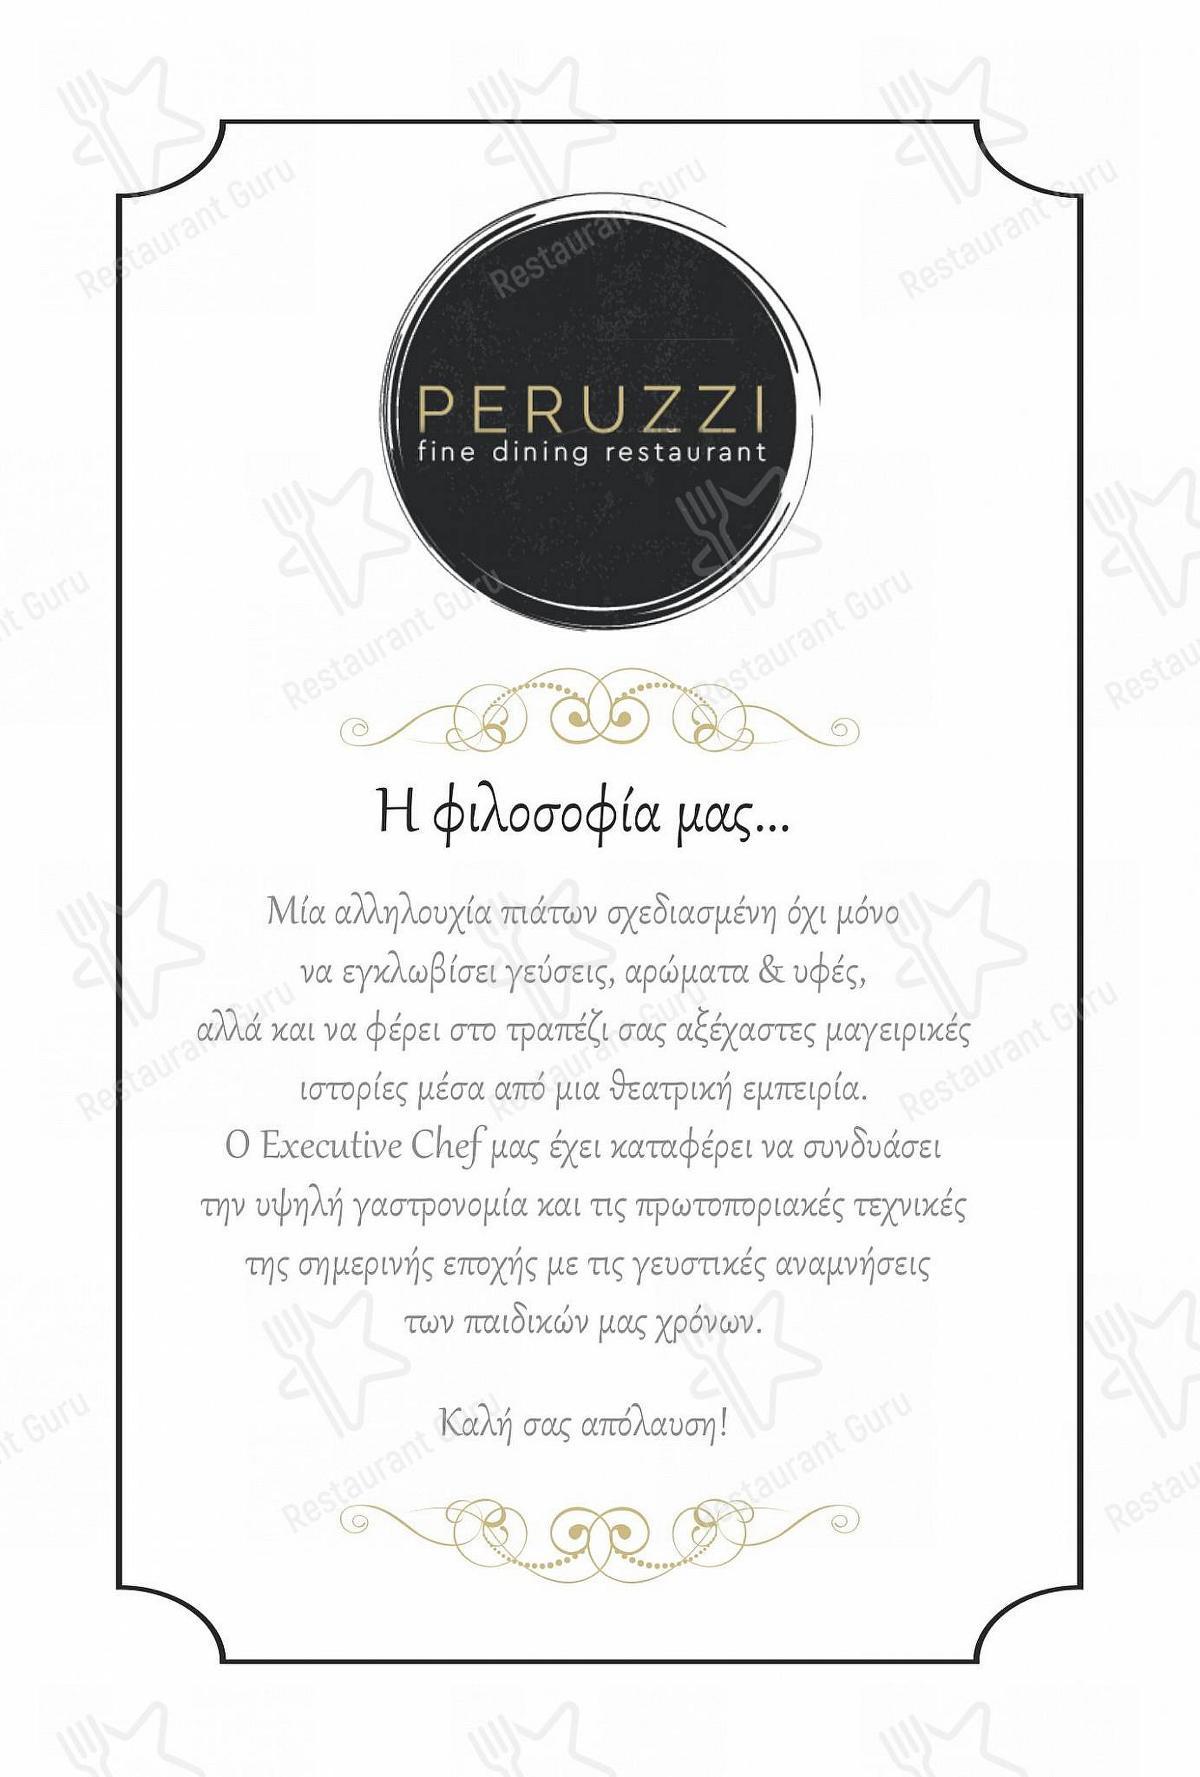 Peruzzi Restaurant in Kos - Food Menu